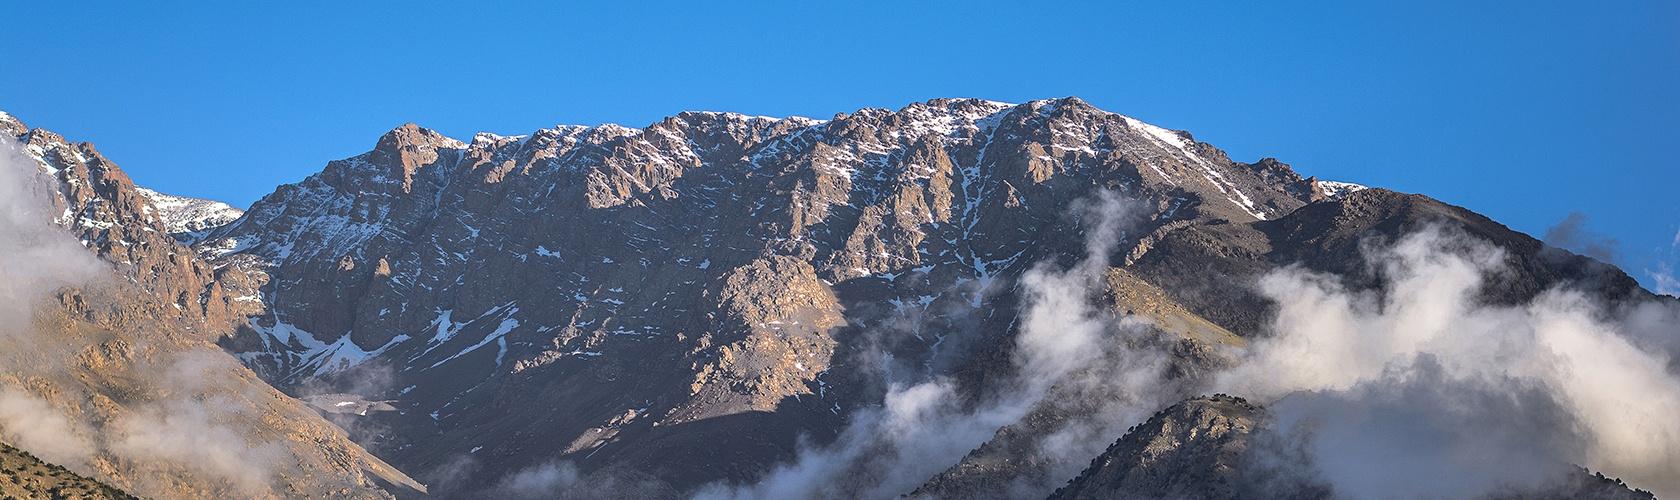 The Tazaghart Plateau